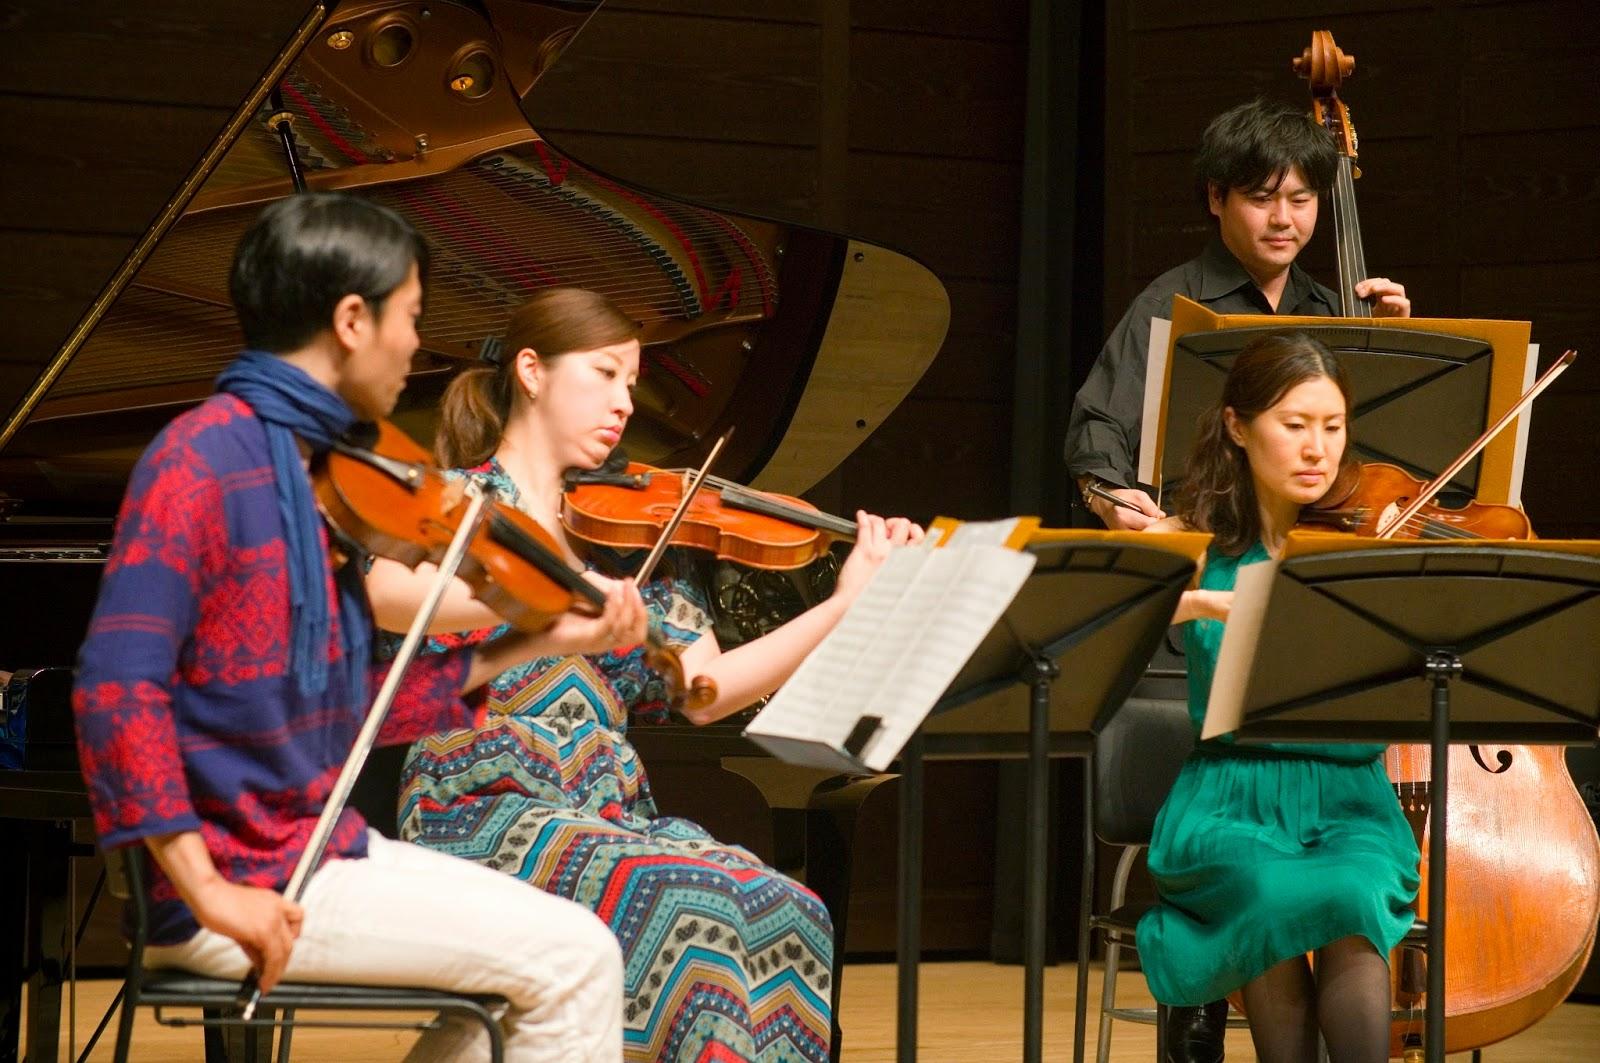 ROSCO MOTION ORCHESTRA,ロスコモーションオーケストラ, live